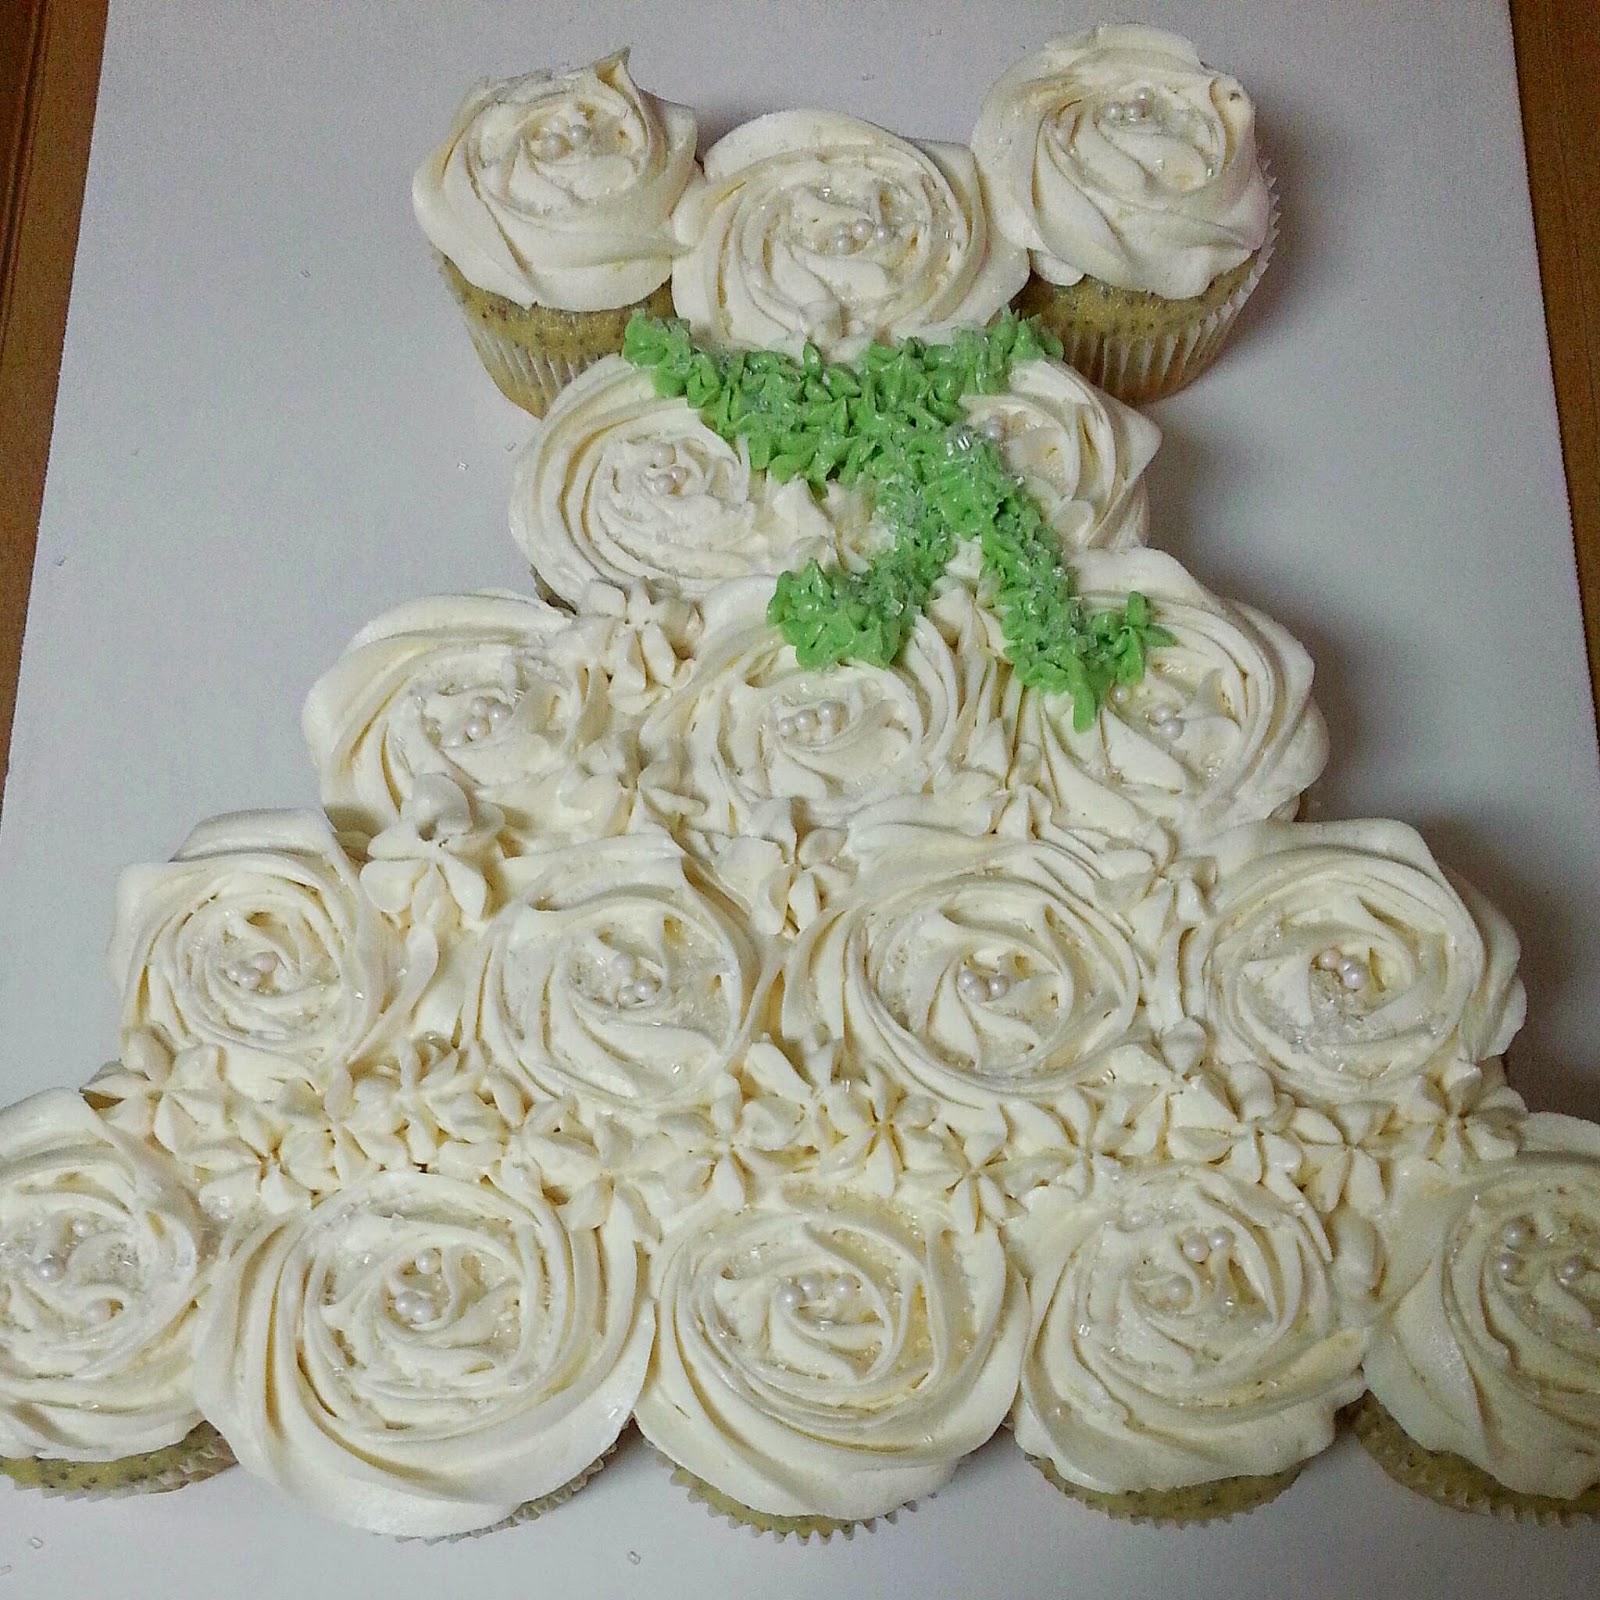 Stephanie s Sweets and More Wedding Dress Cupcake Cake 2 0